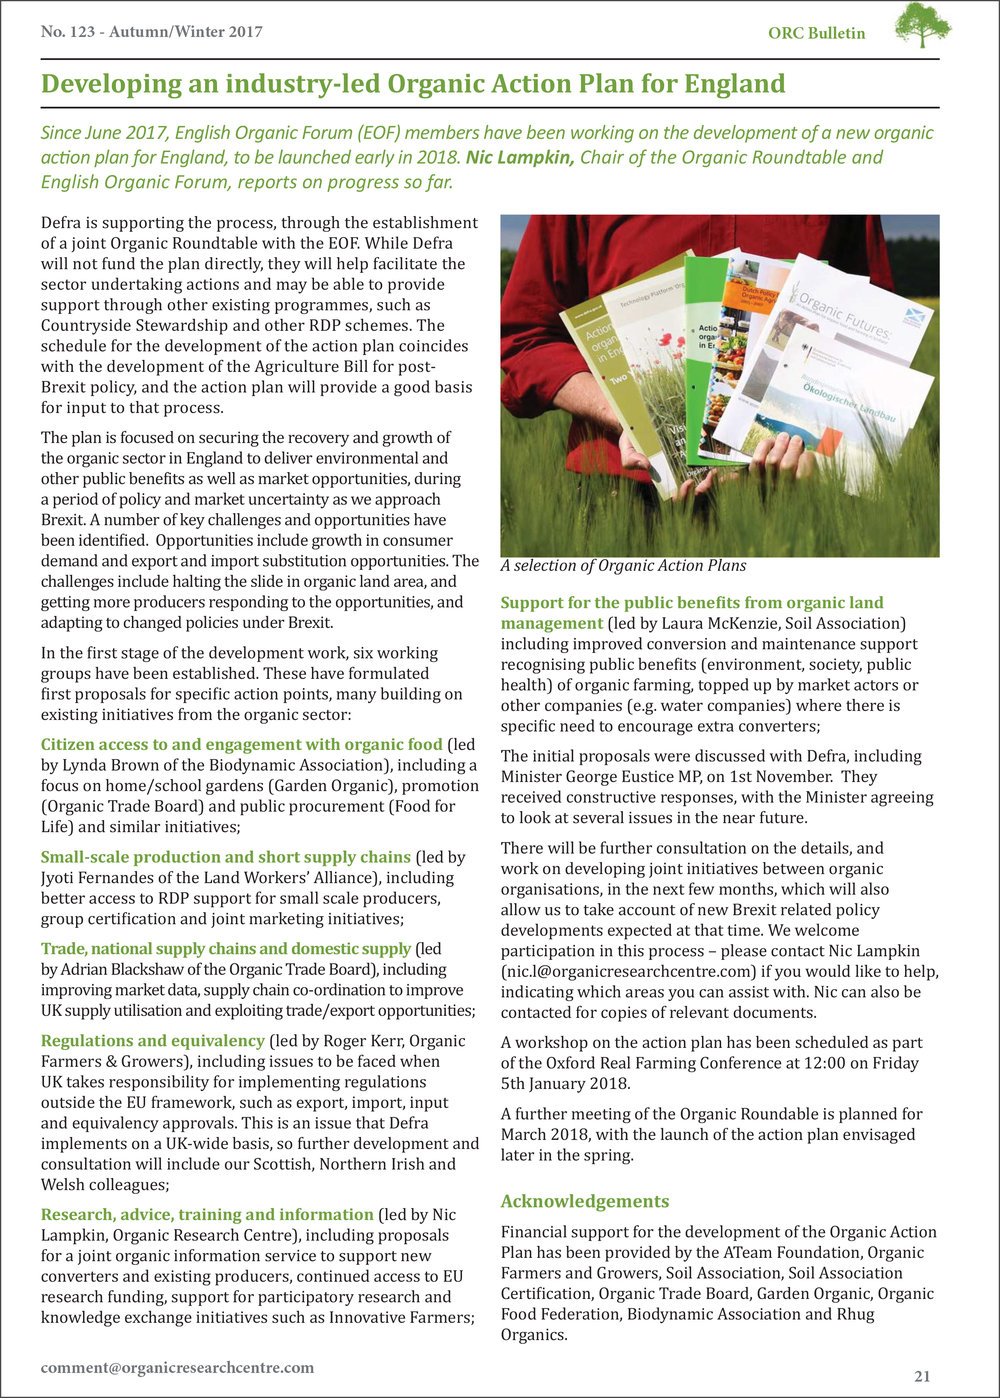 ORC123_print.pdf